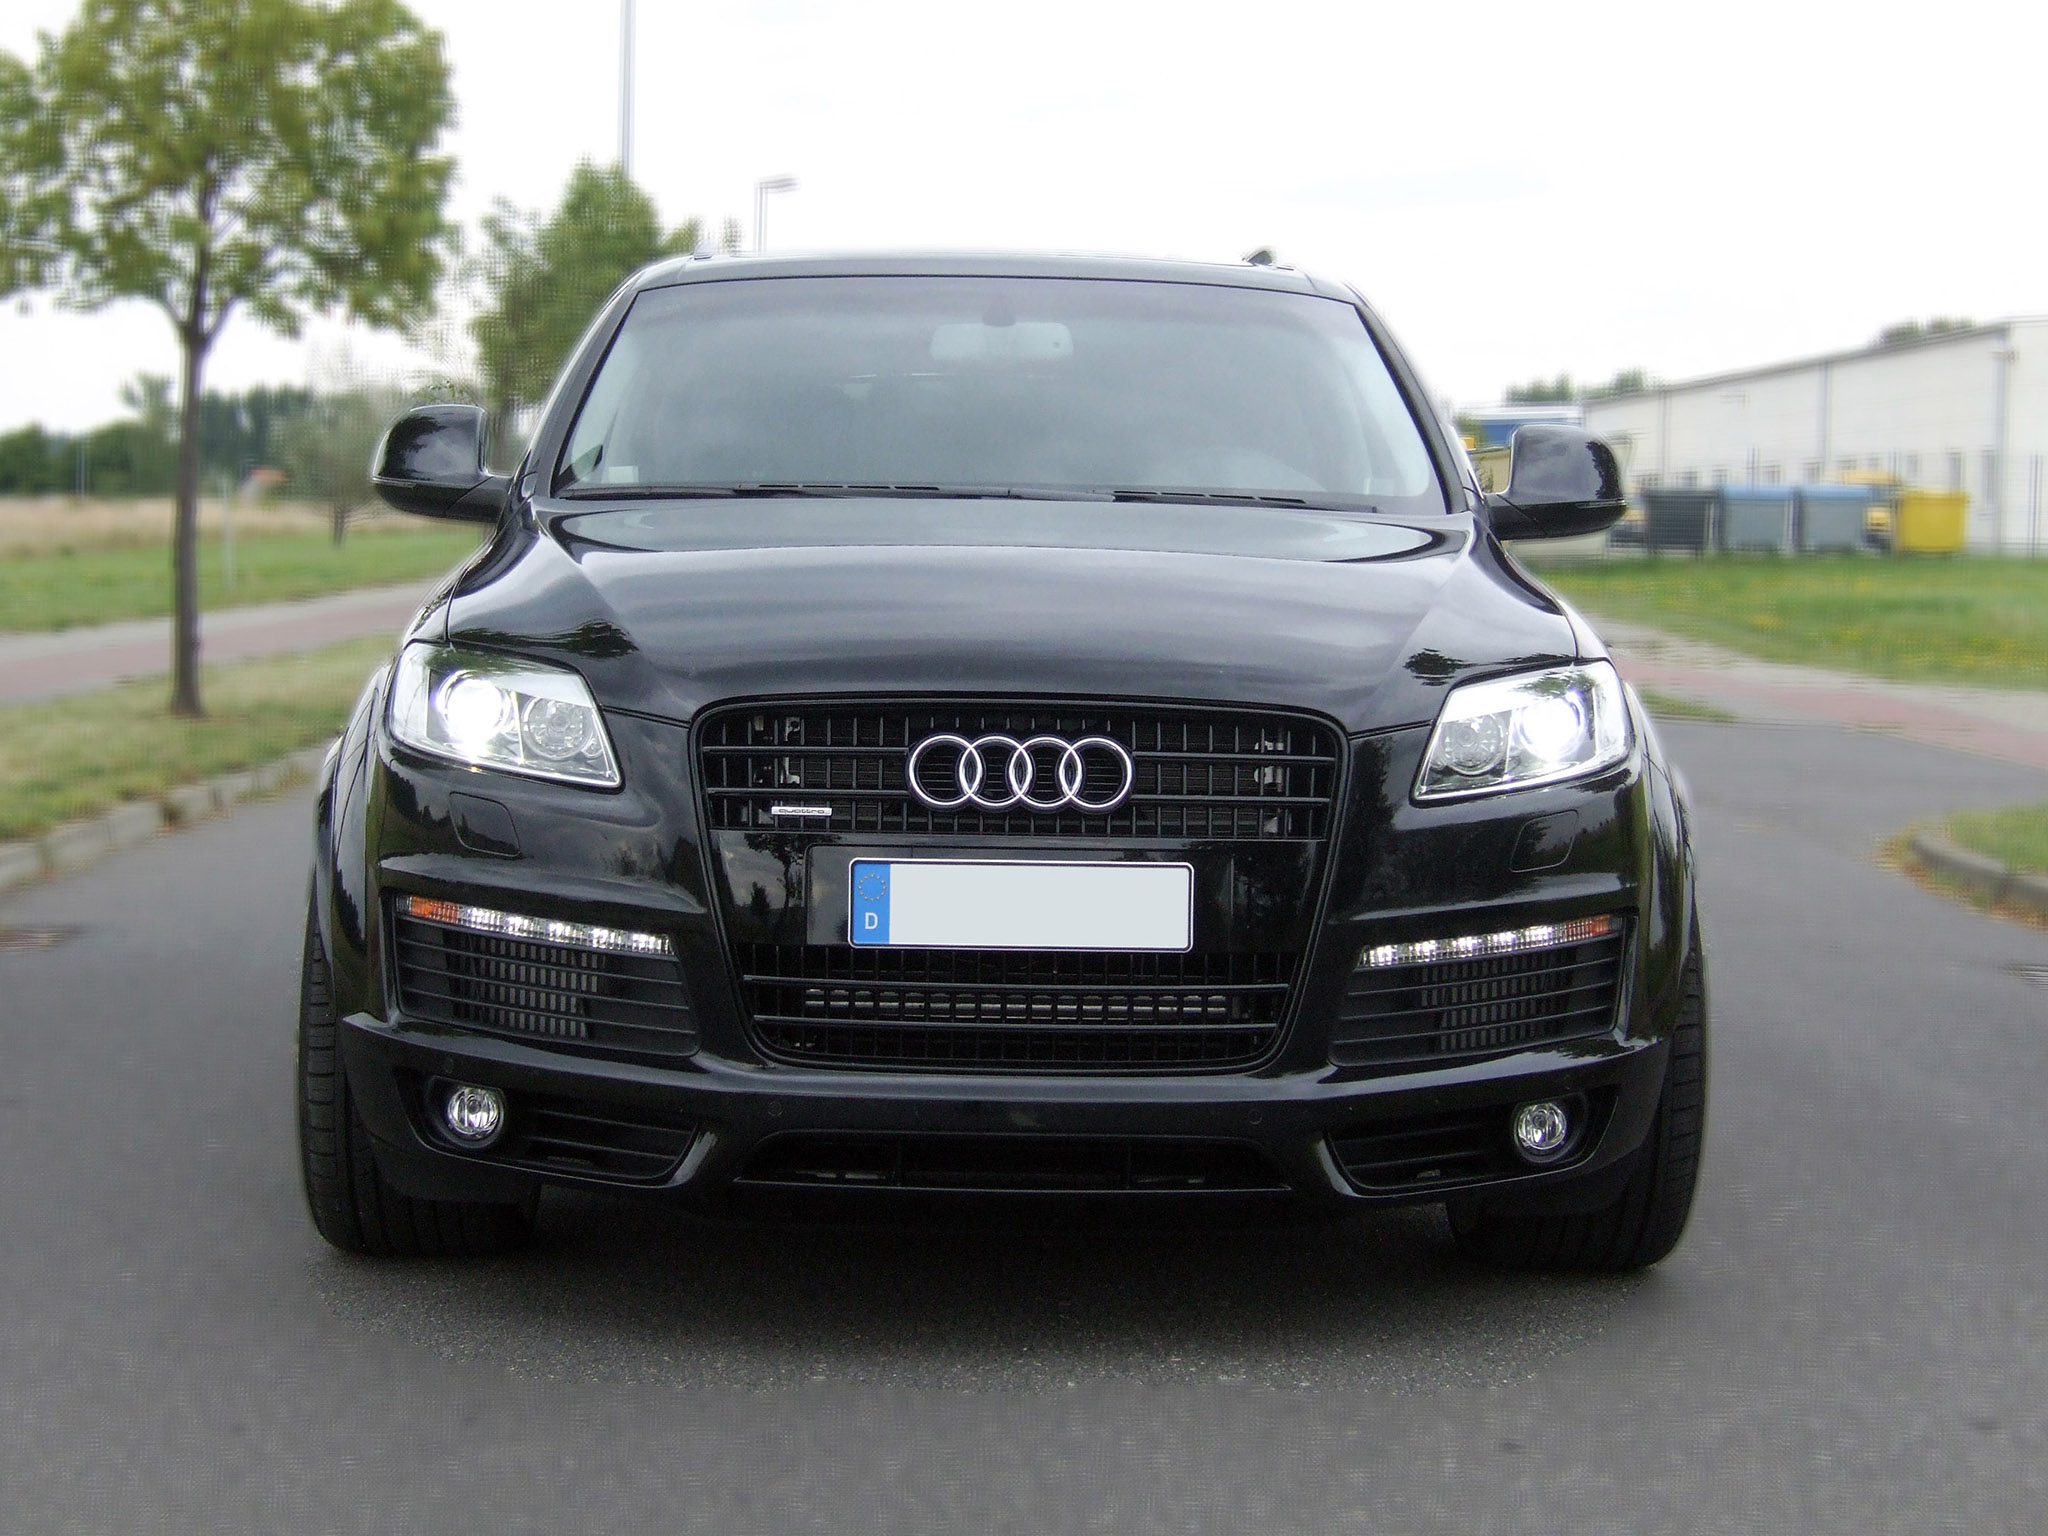 Avus Performance Audi Q7 2009 Avus Performance Audi Q7